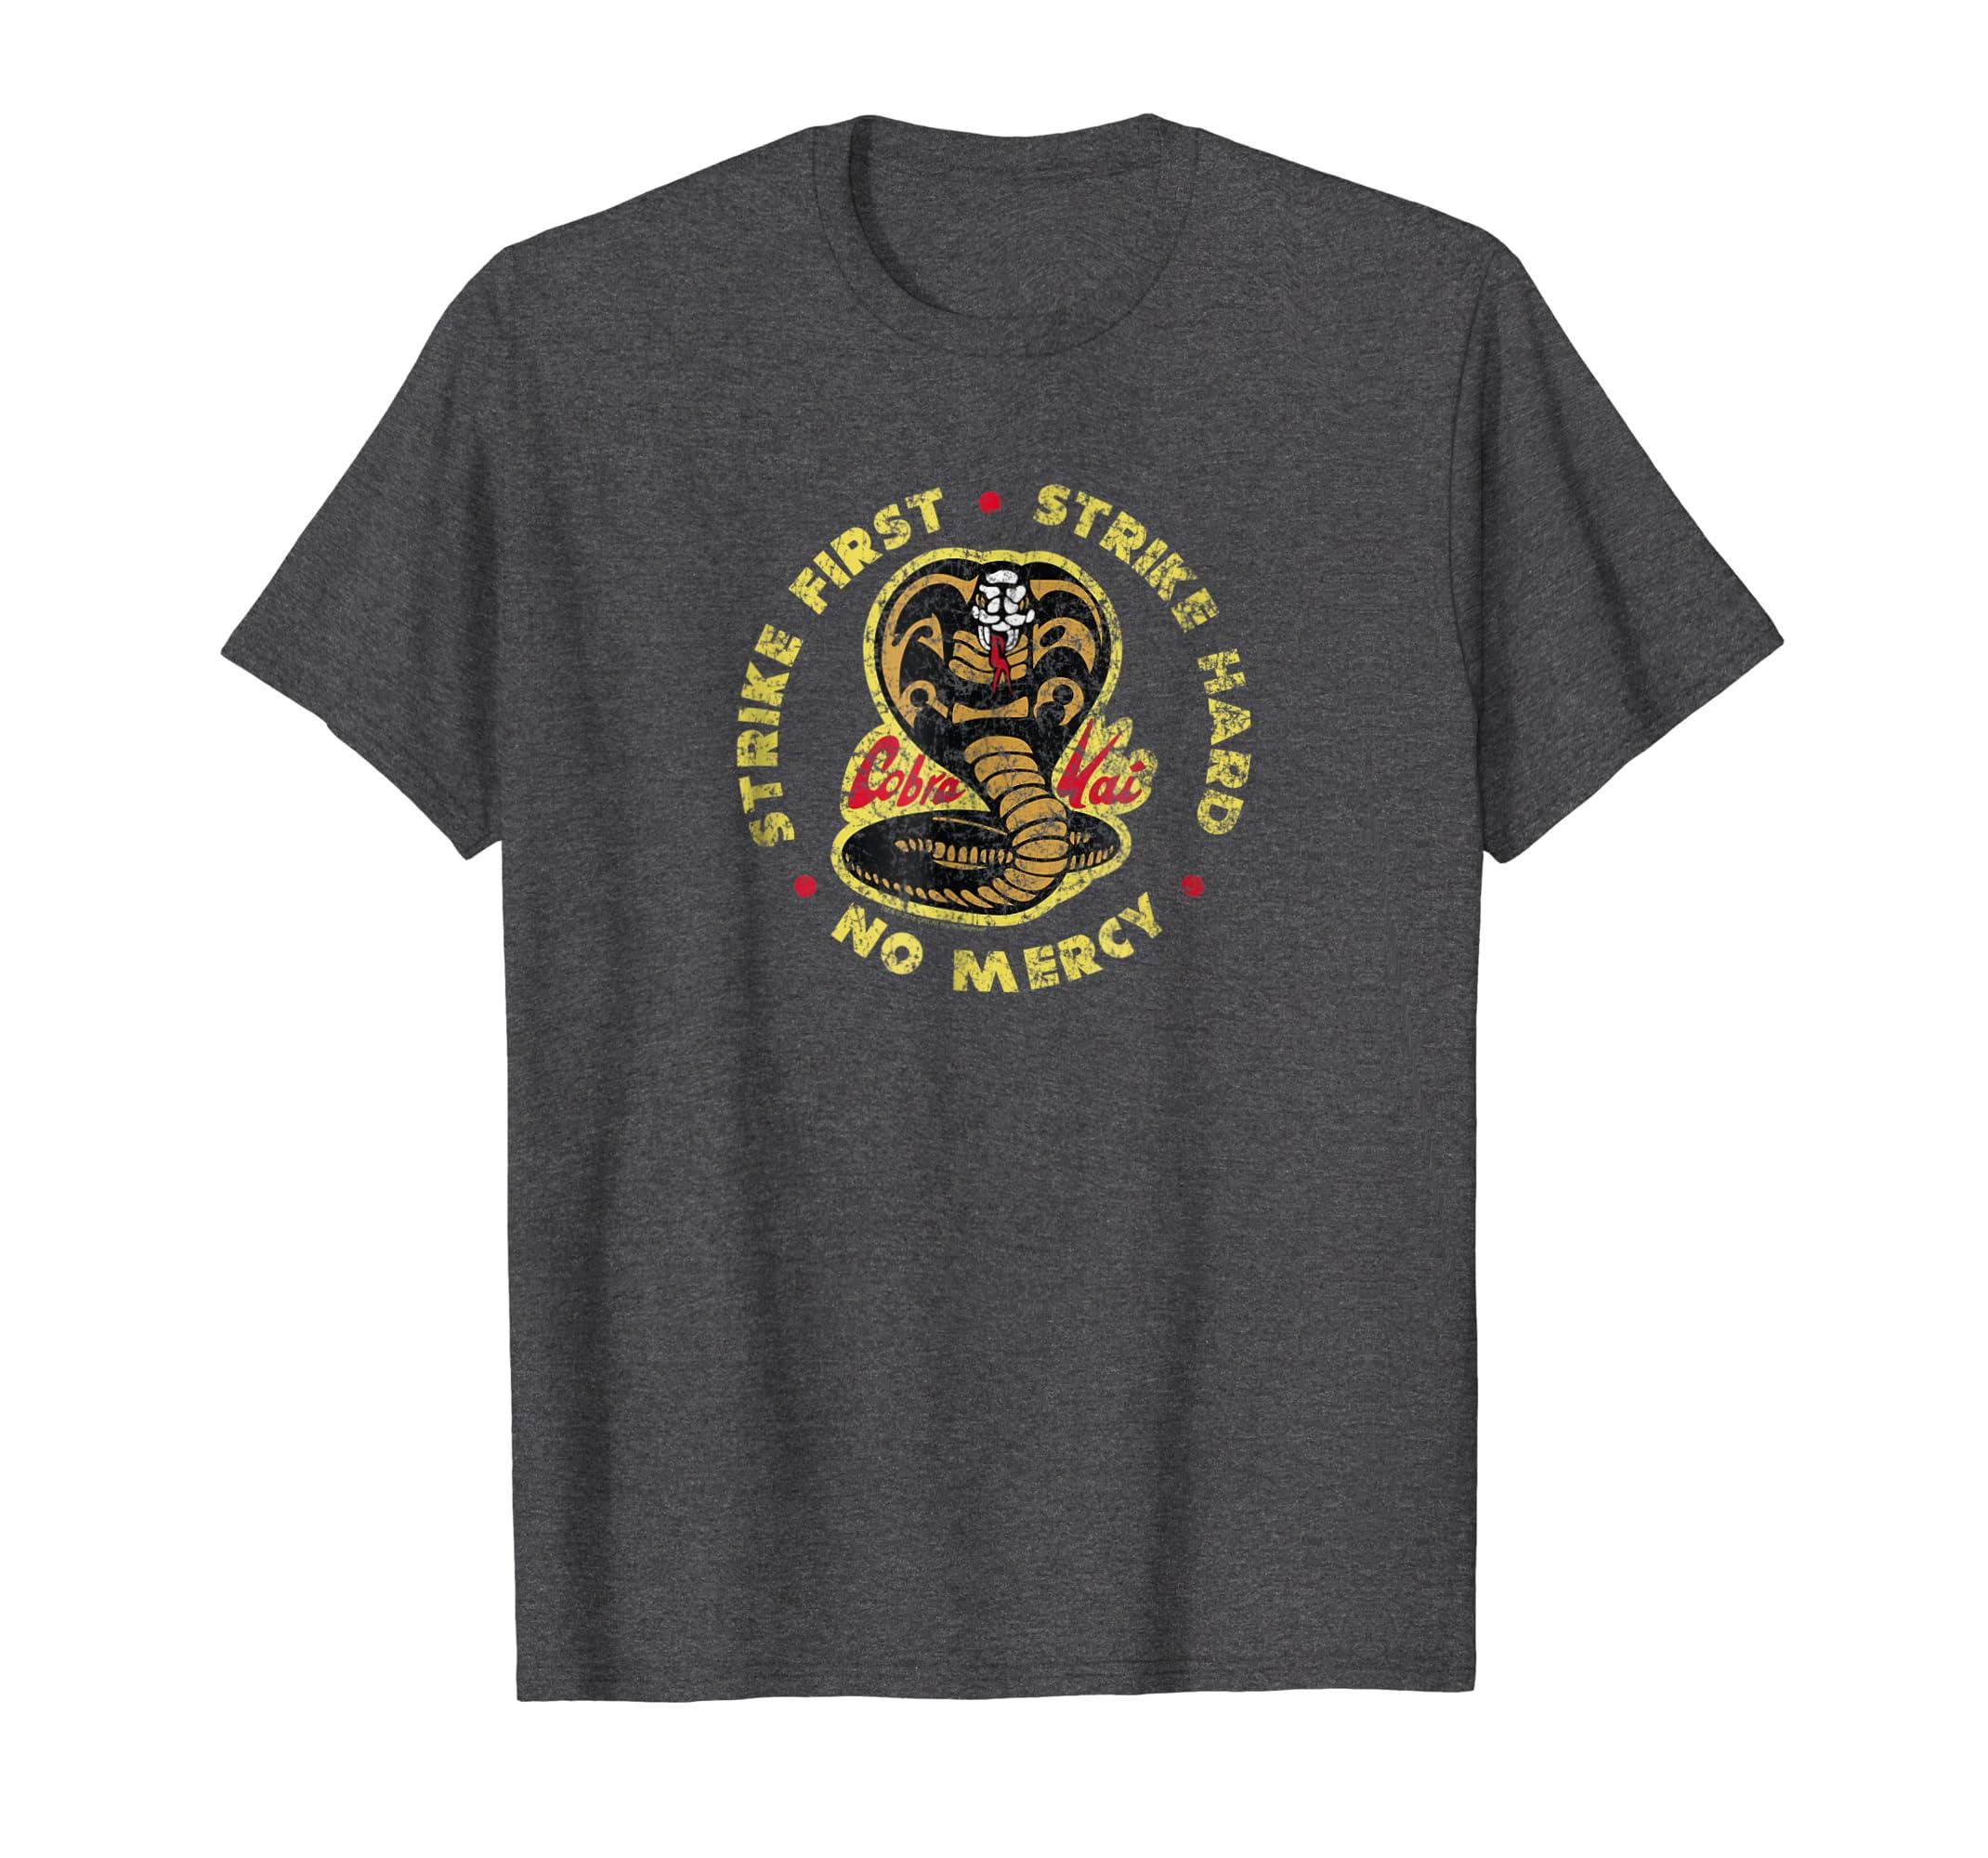 2c26bed1 Amazon.com: The Karate Kid Cobra Kai Vintage T-shirt: Clothing